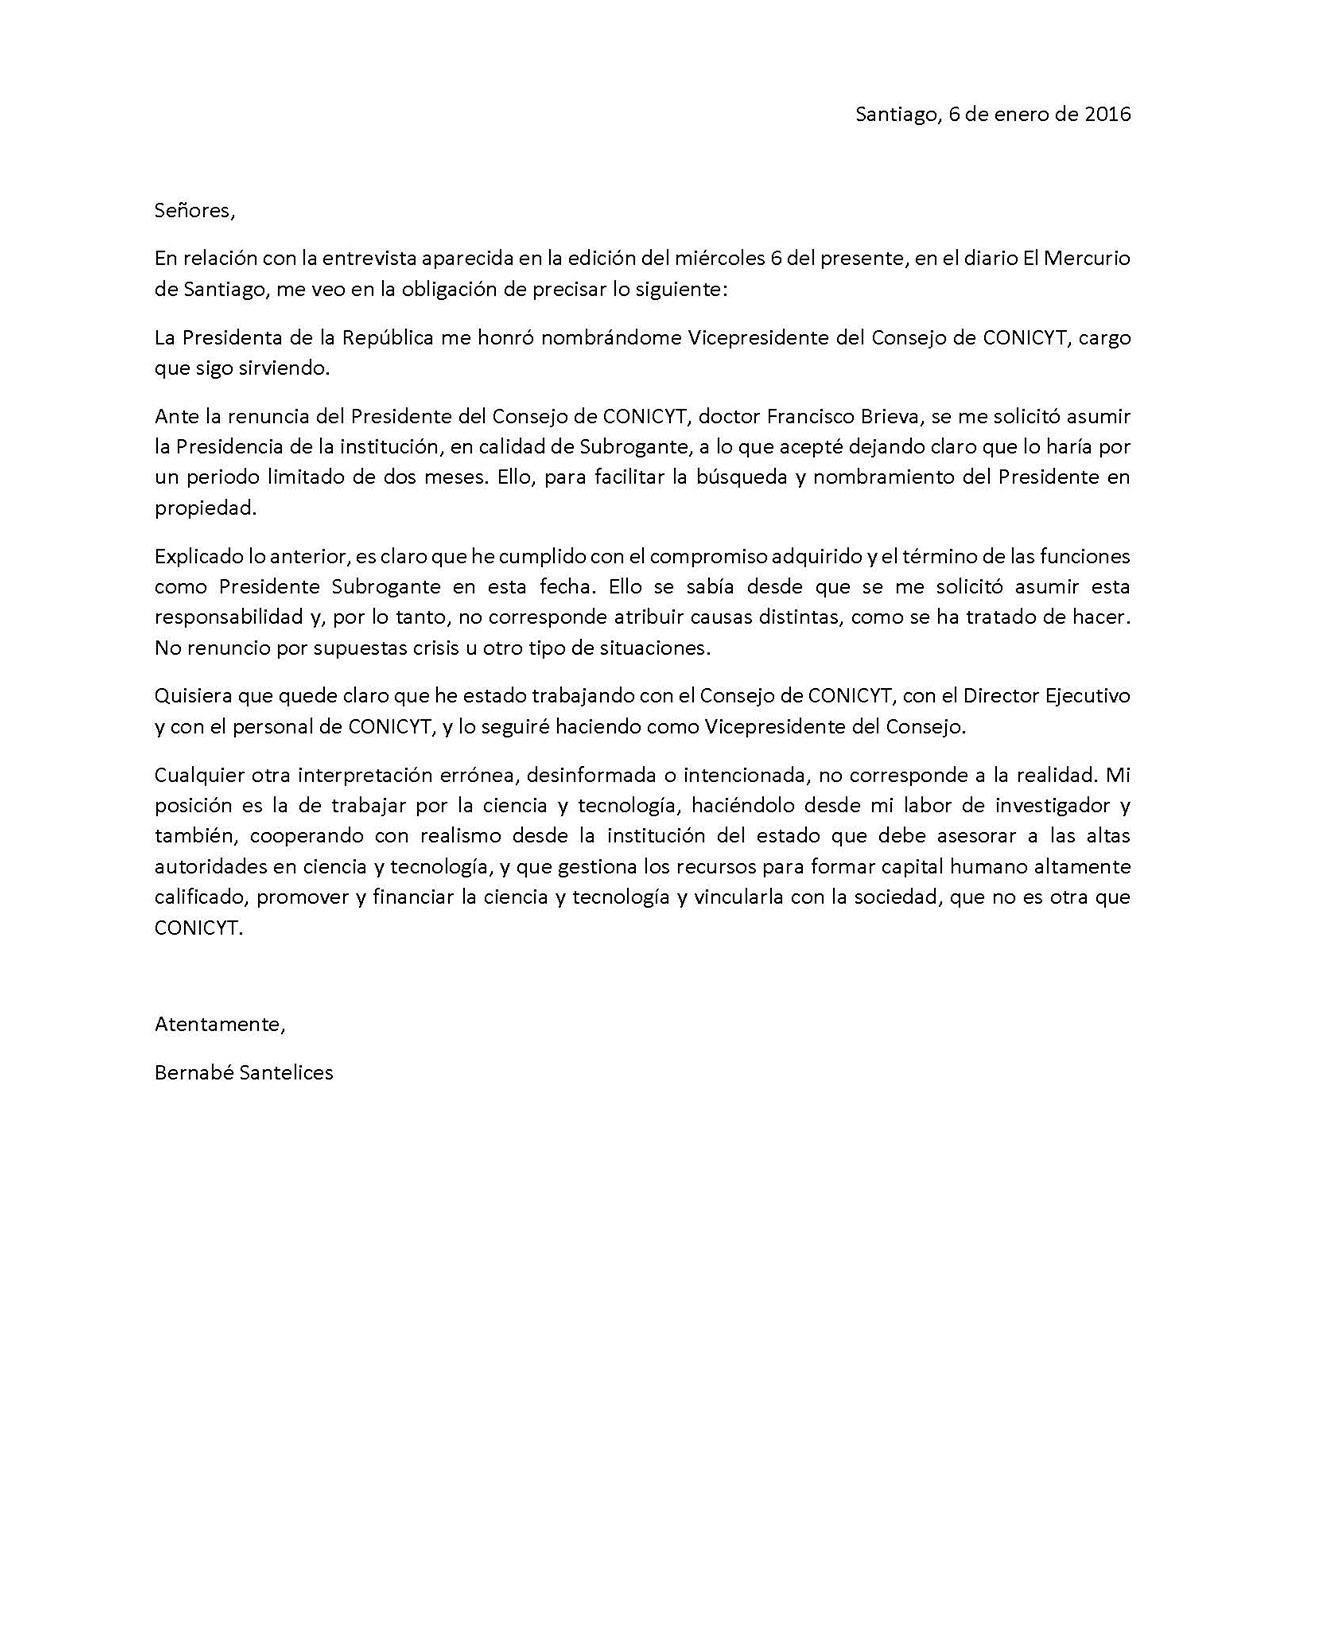 Carta-Bernabe-Santelices